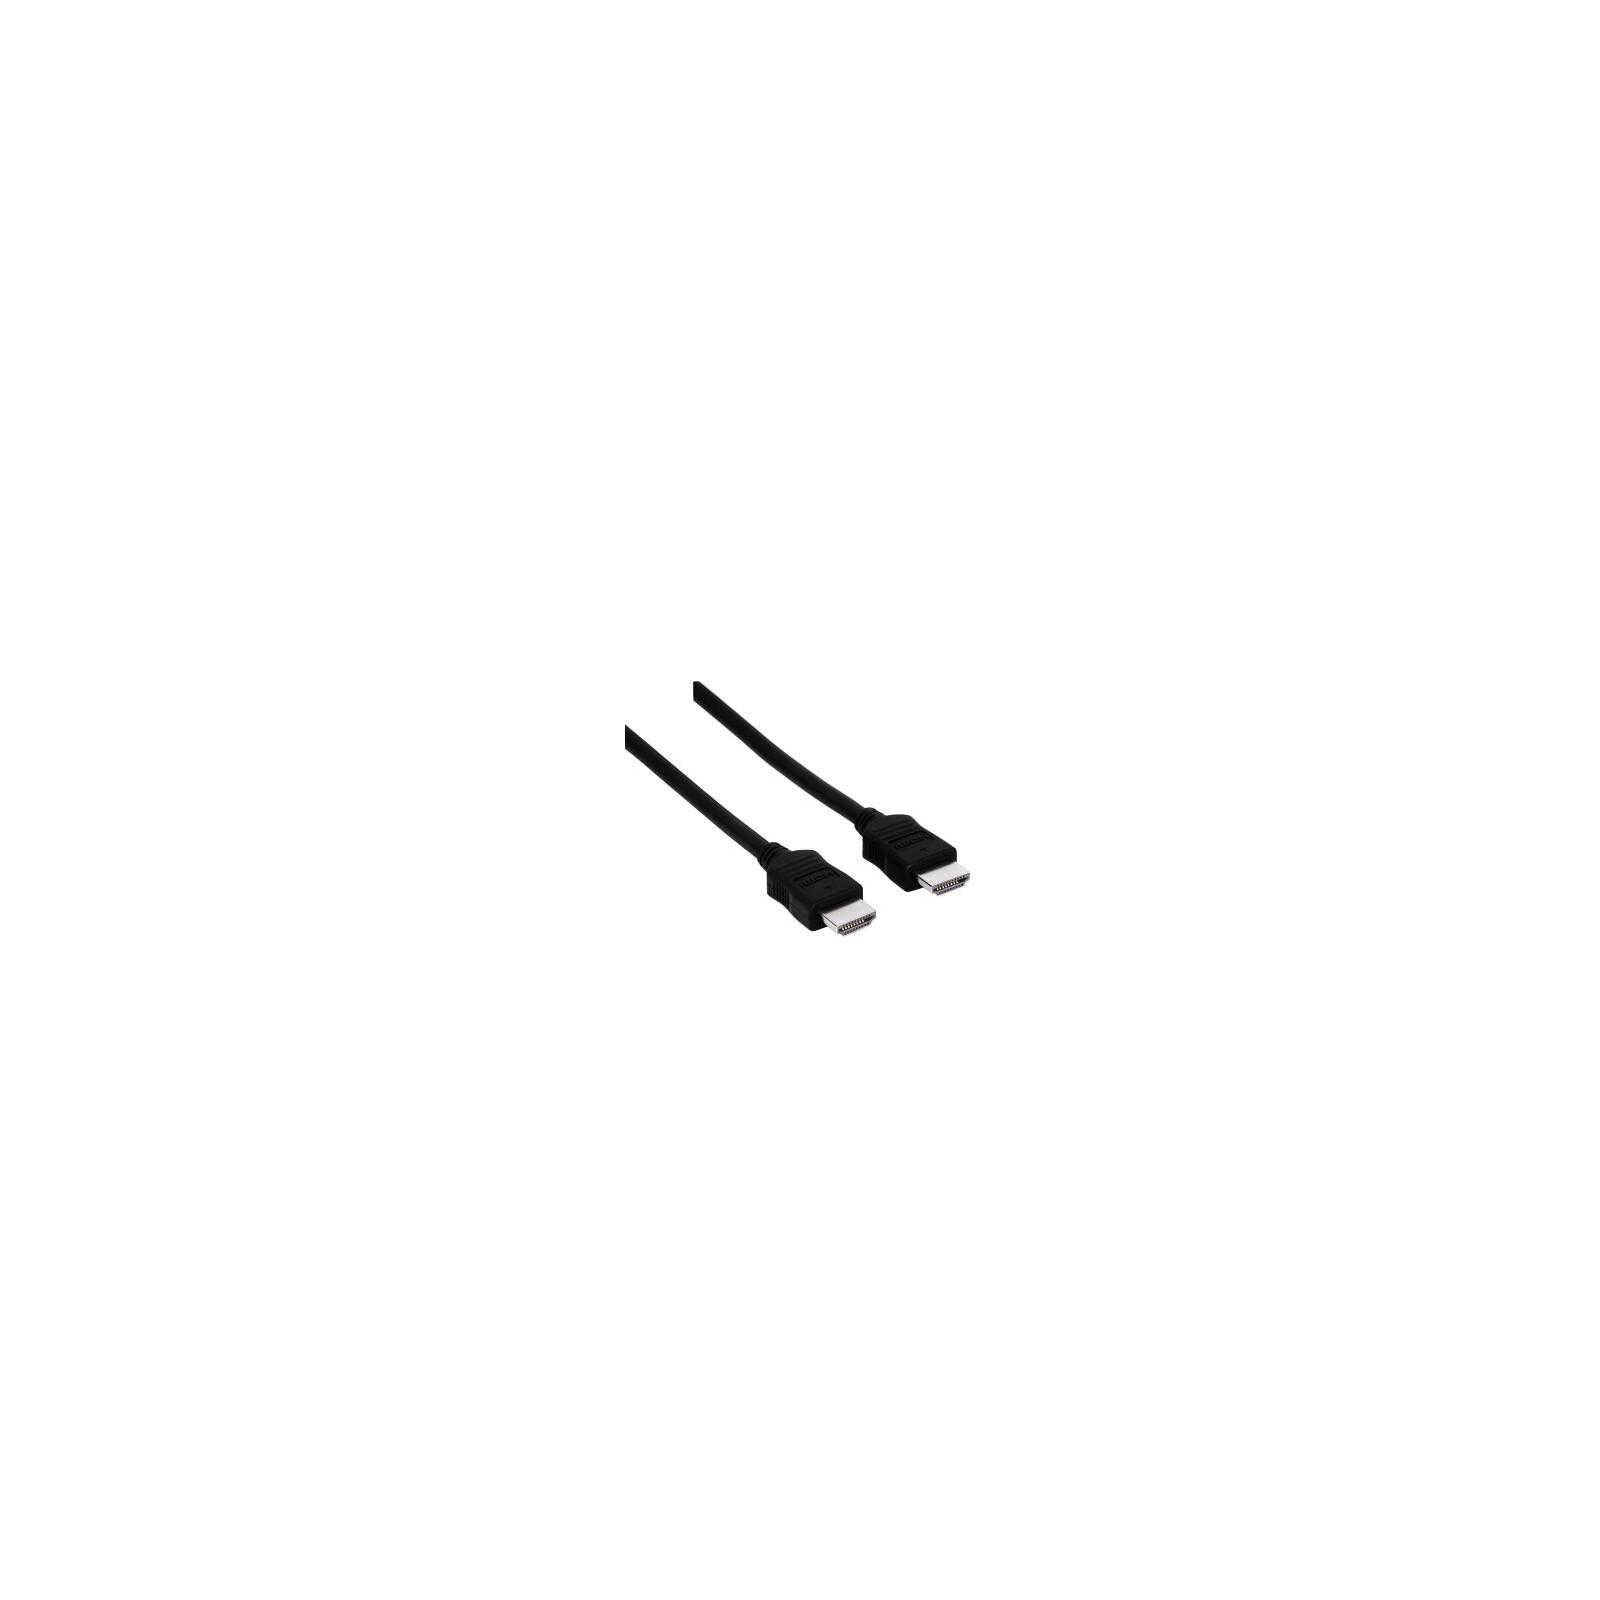 Hama 11959 HDMI Stecker-Stecker 3m